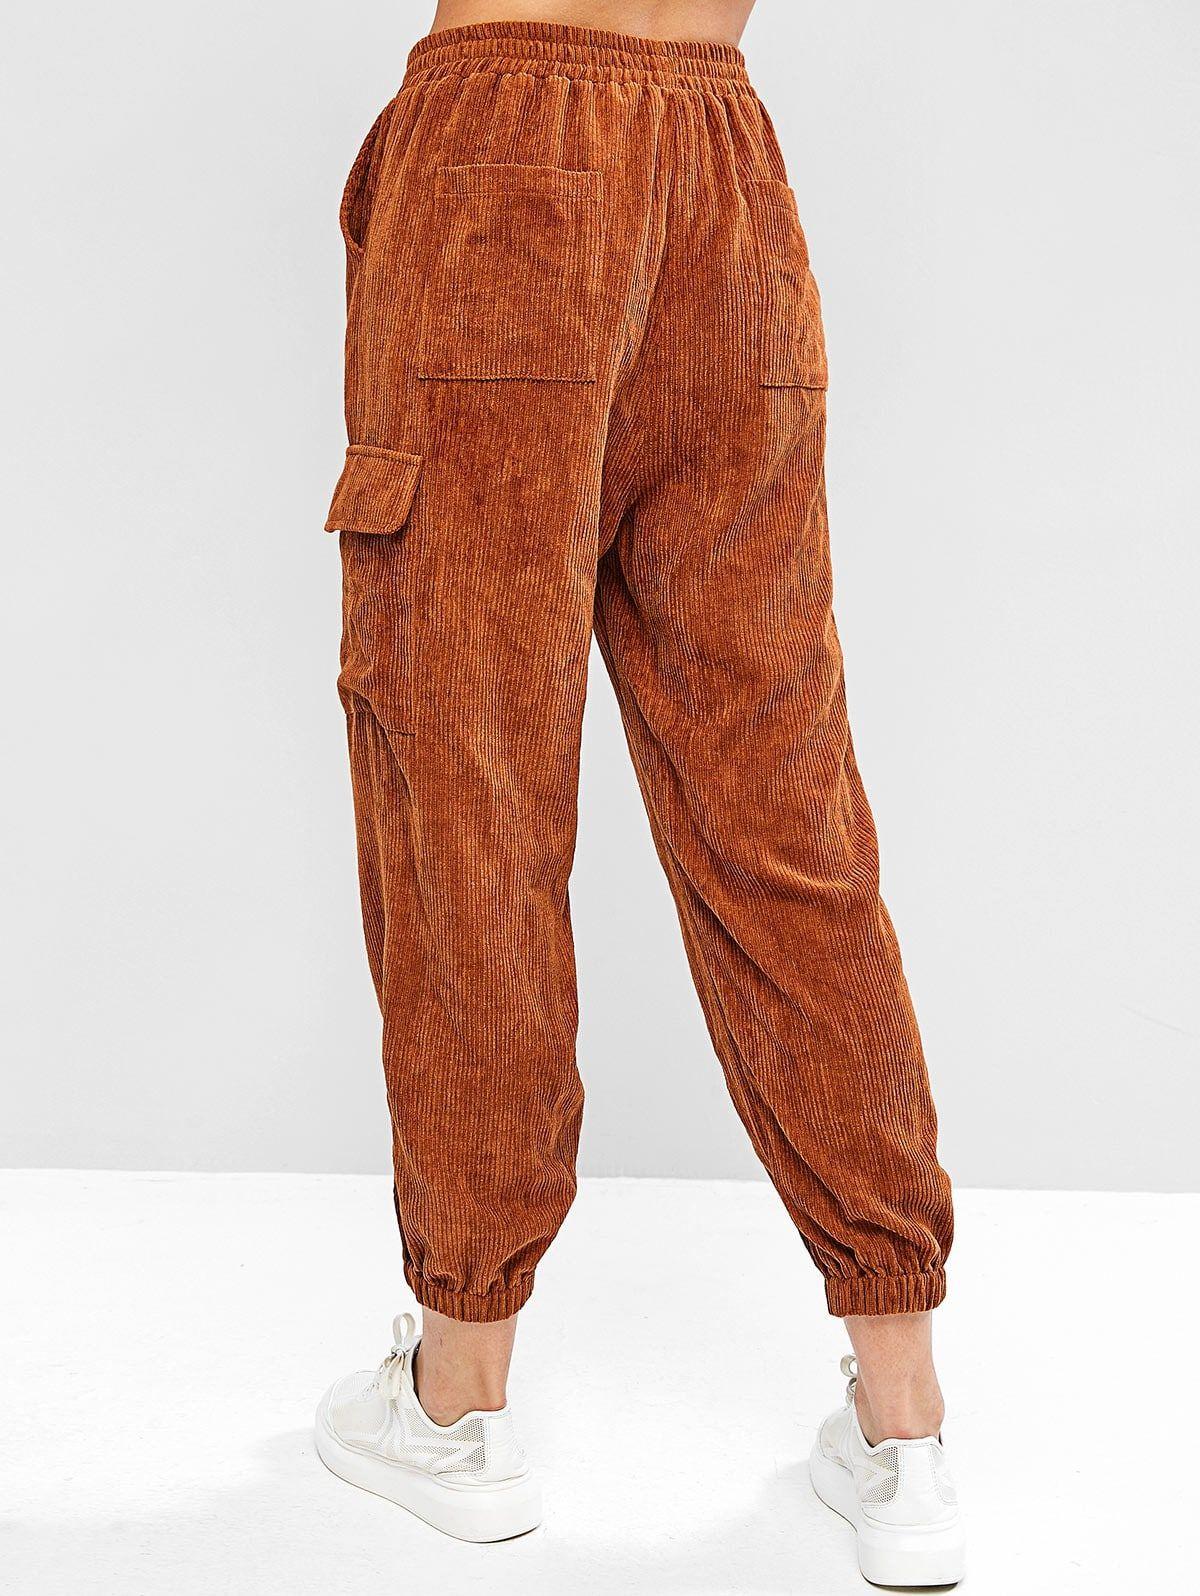 Zaful Corduroy Mid Waisted Pocket Jogger Pants Wood